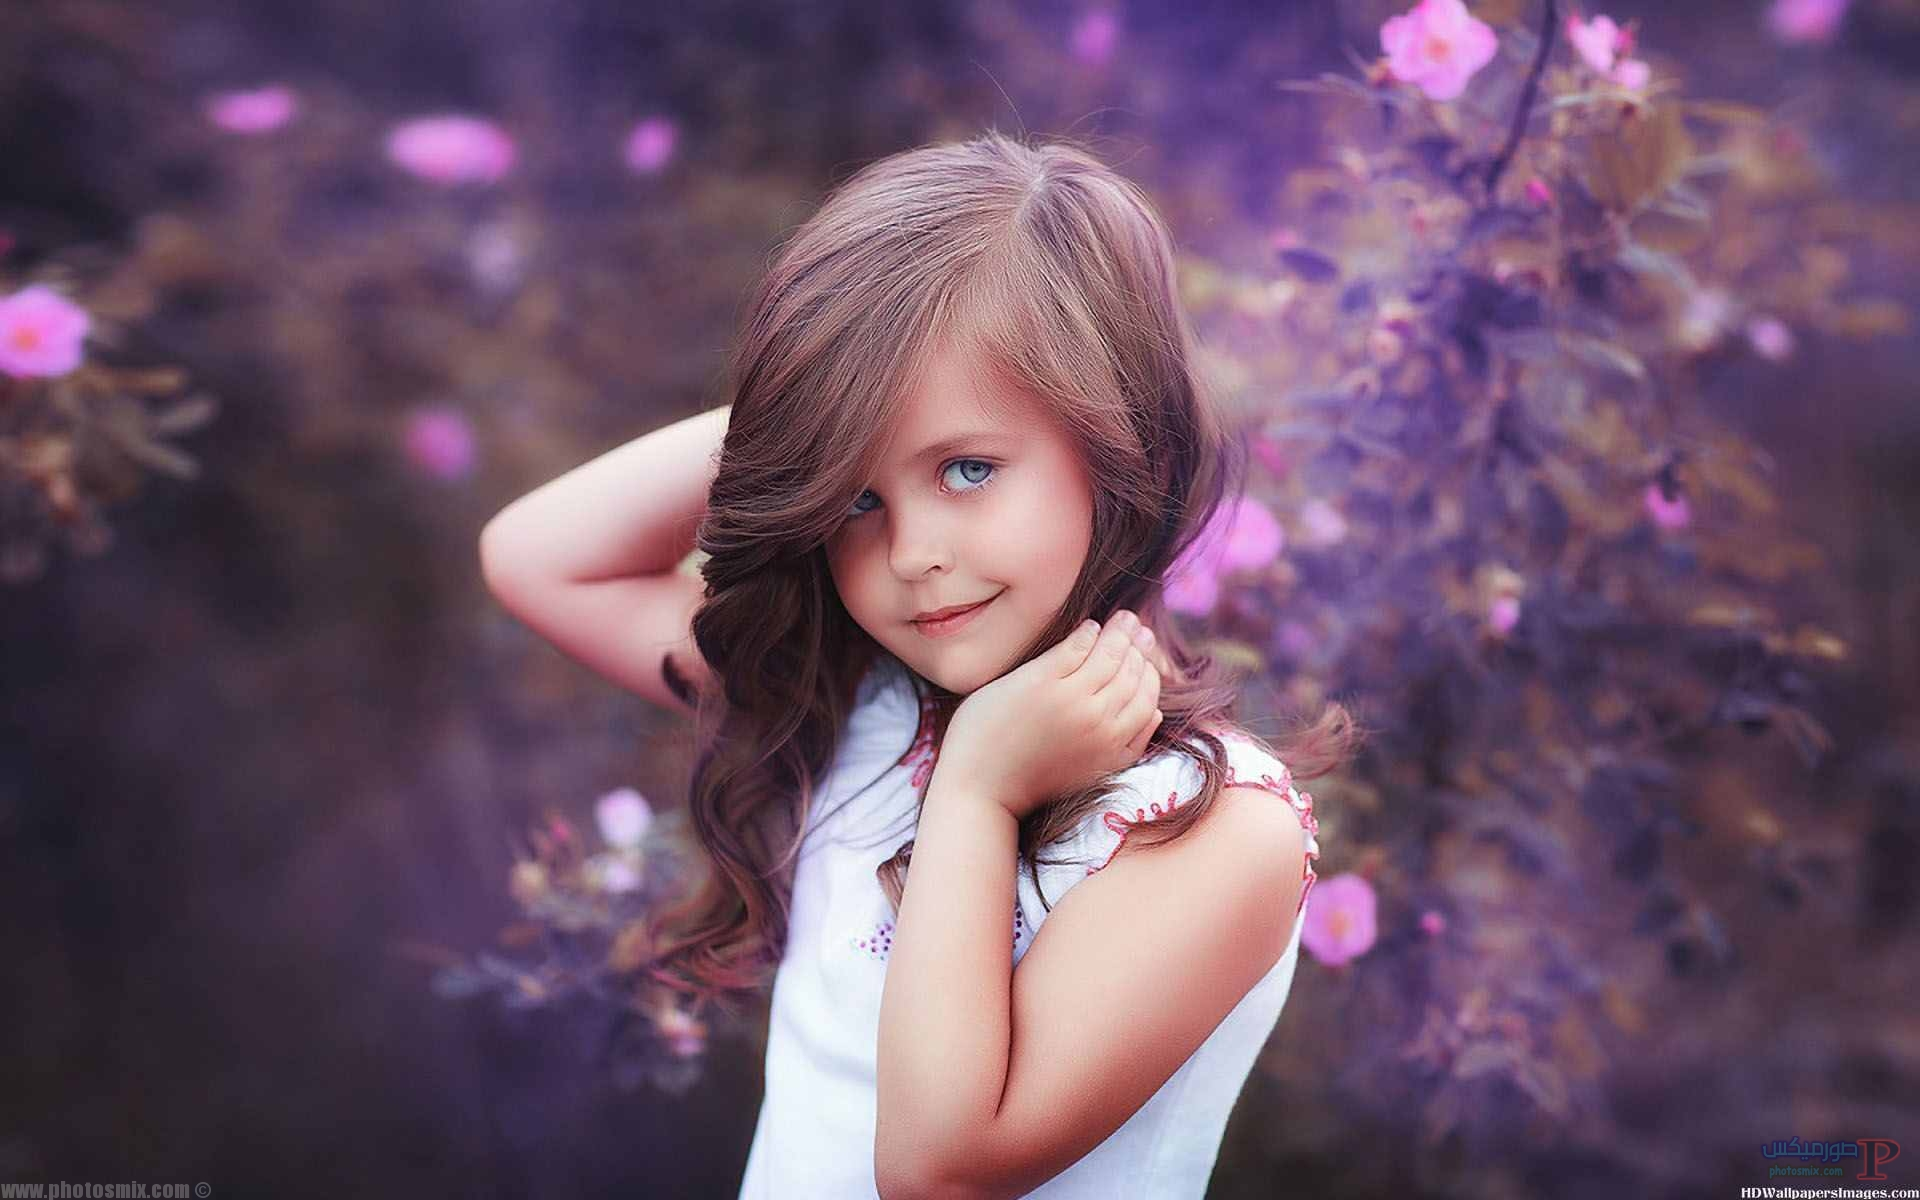 -صور-بنات-كيوت-10 صور أطفال صغار, اجمل صور بيبي, صور اطفال بغمازات, صور أطفال 2018